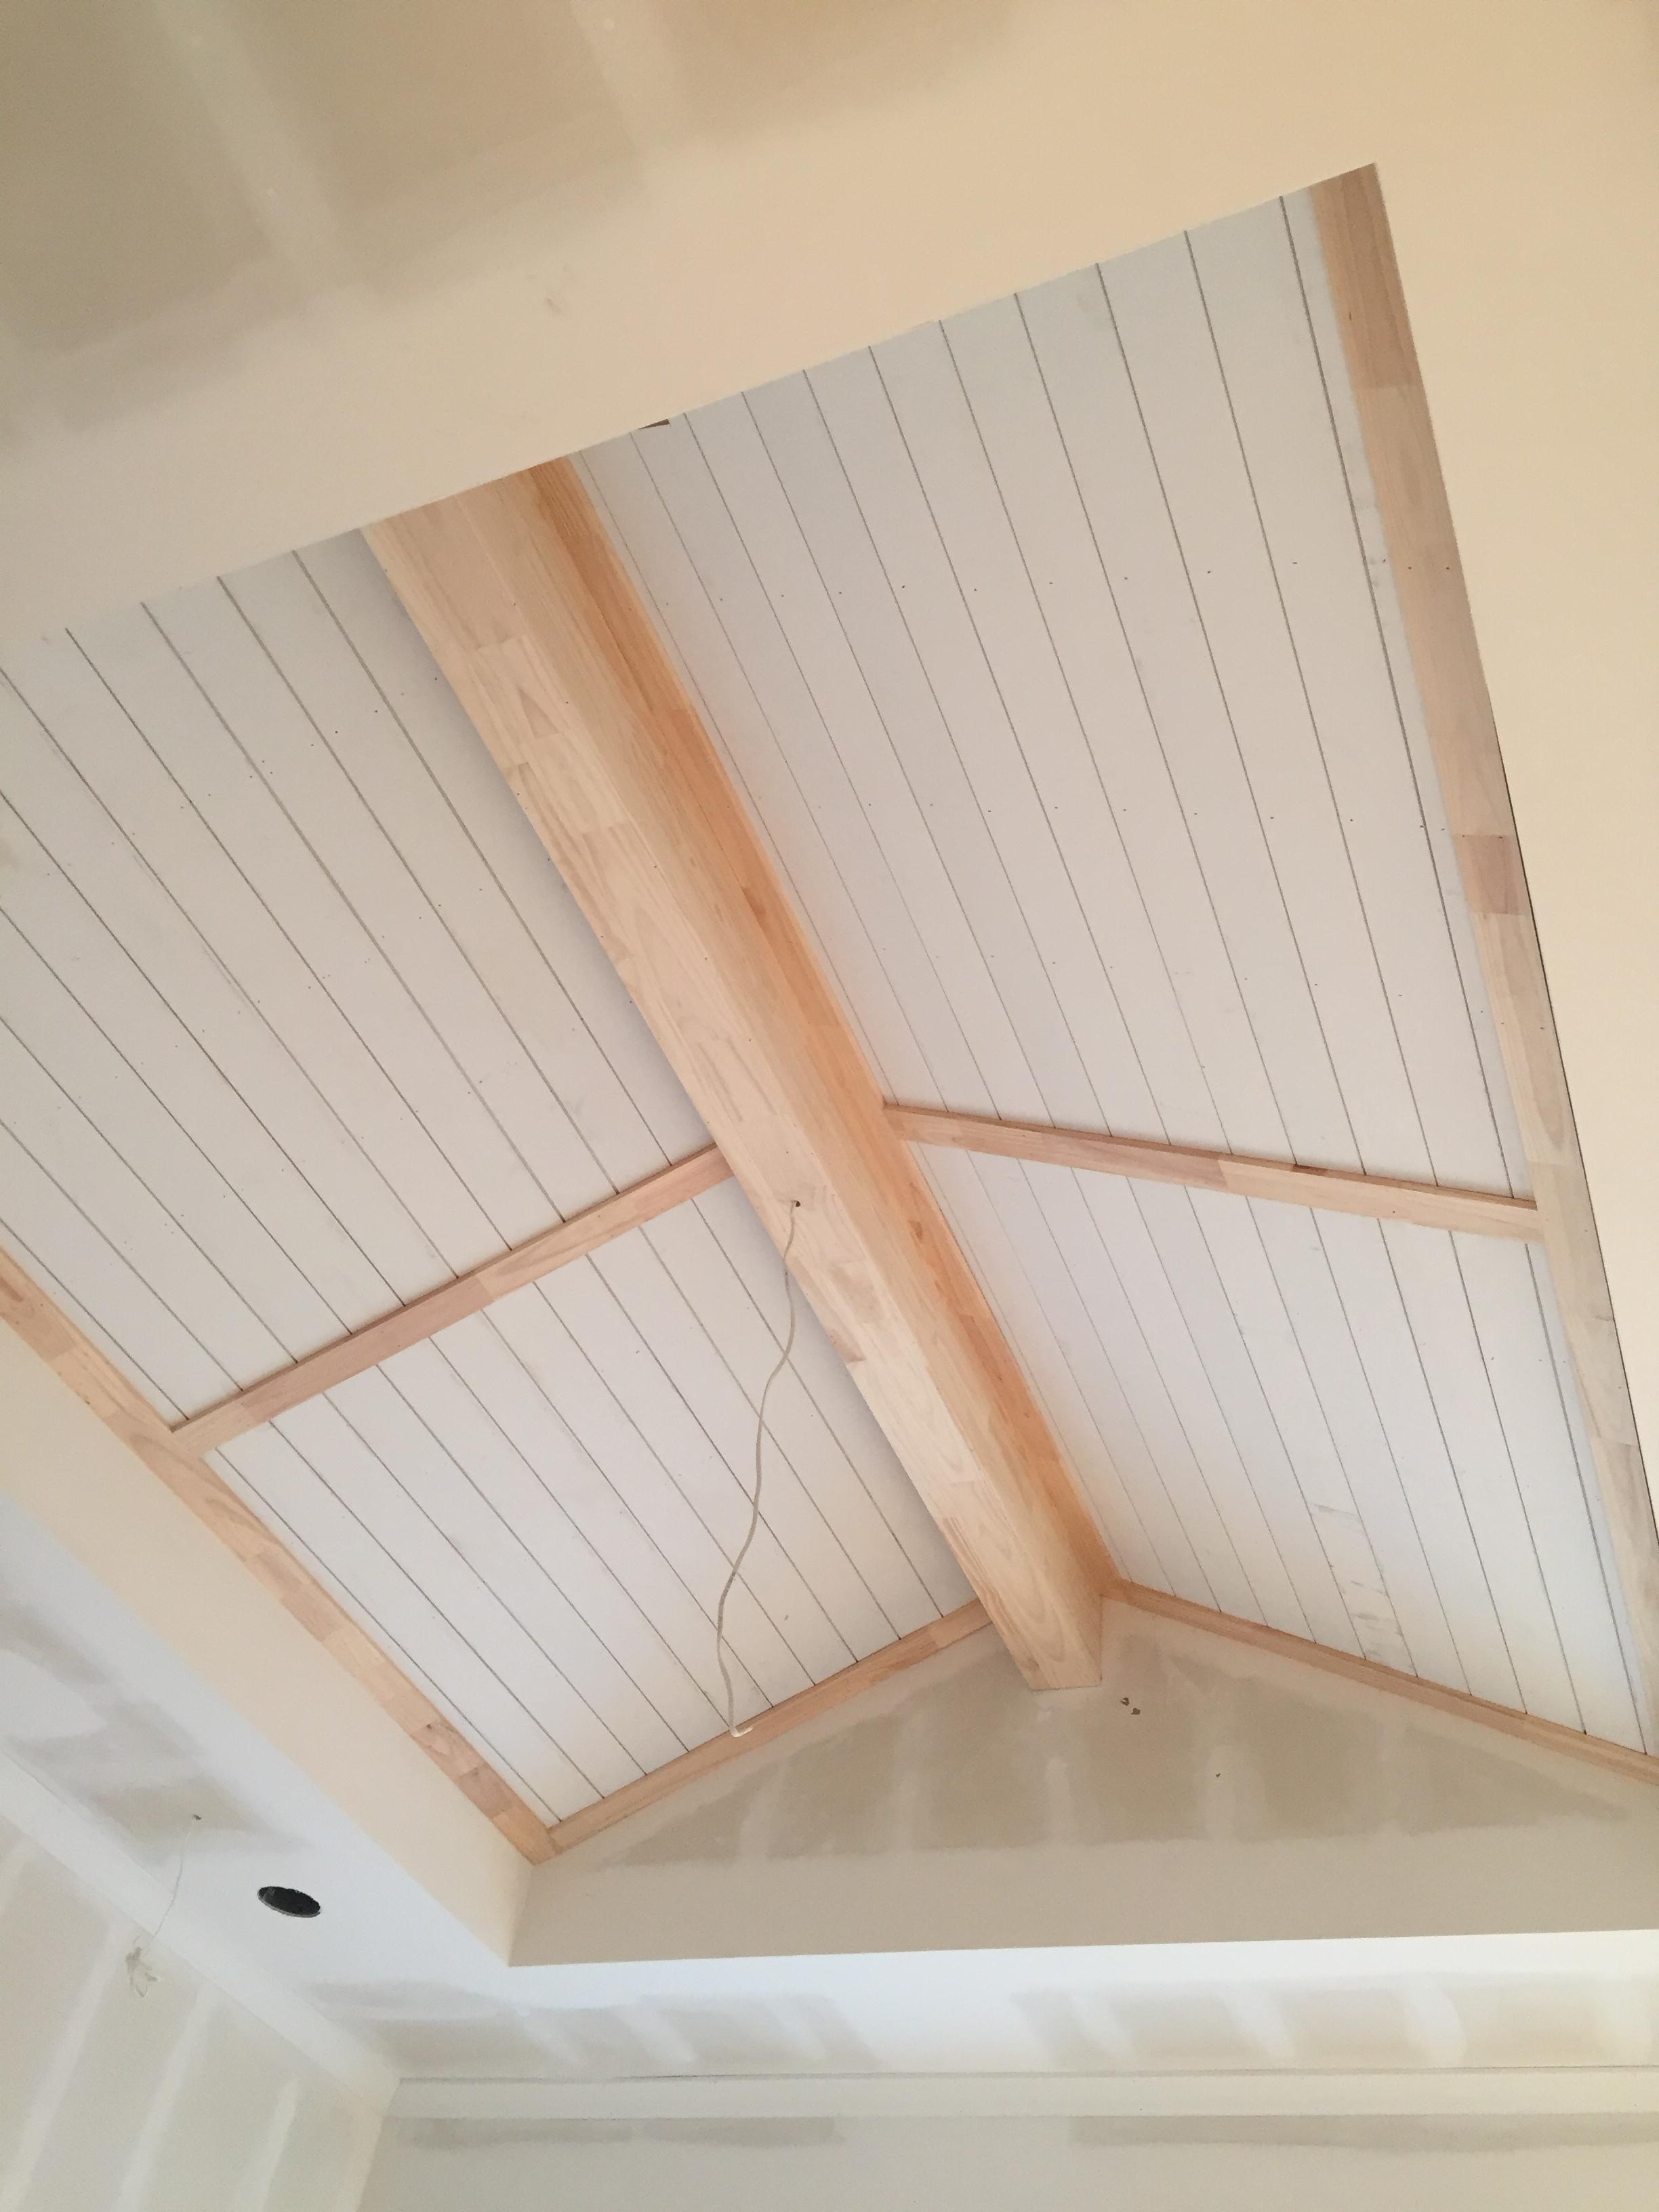 Master bedroom ceiling detail